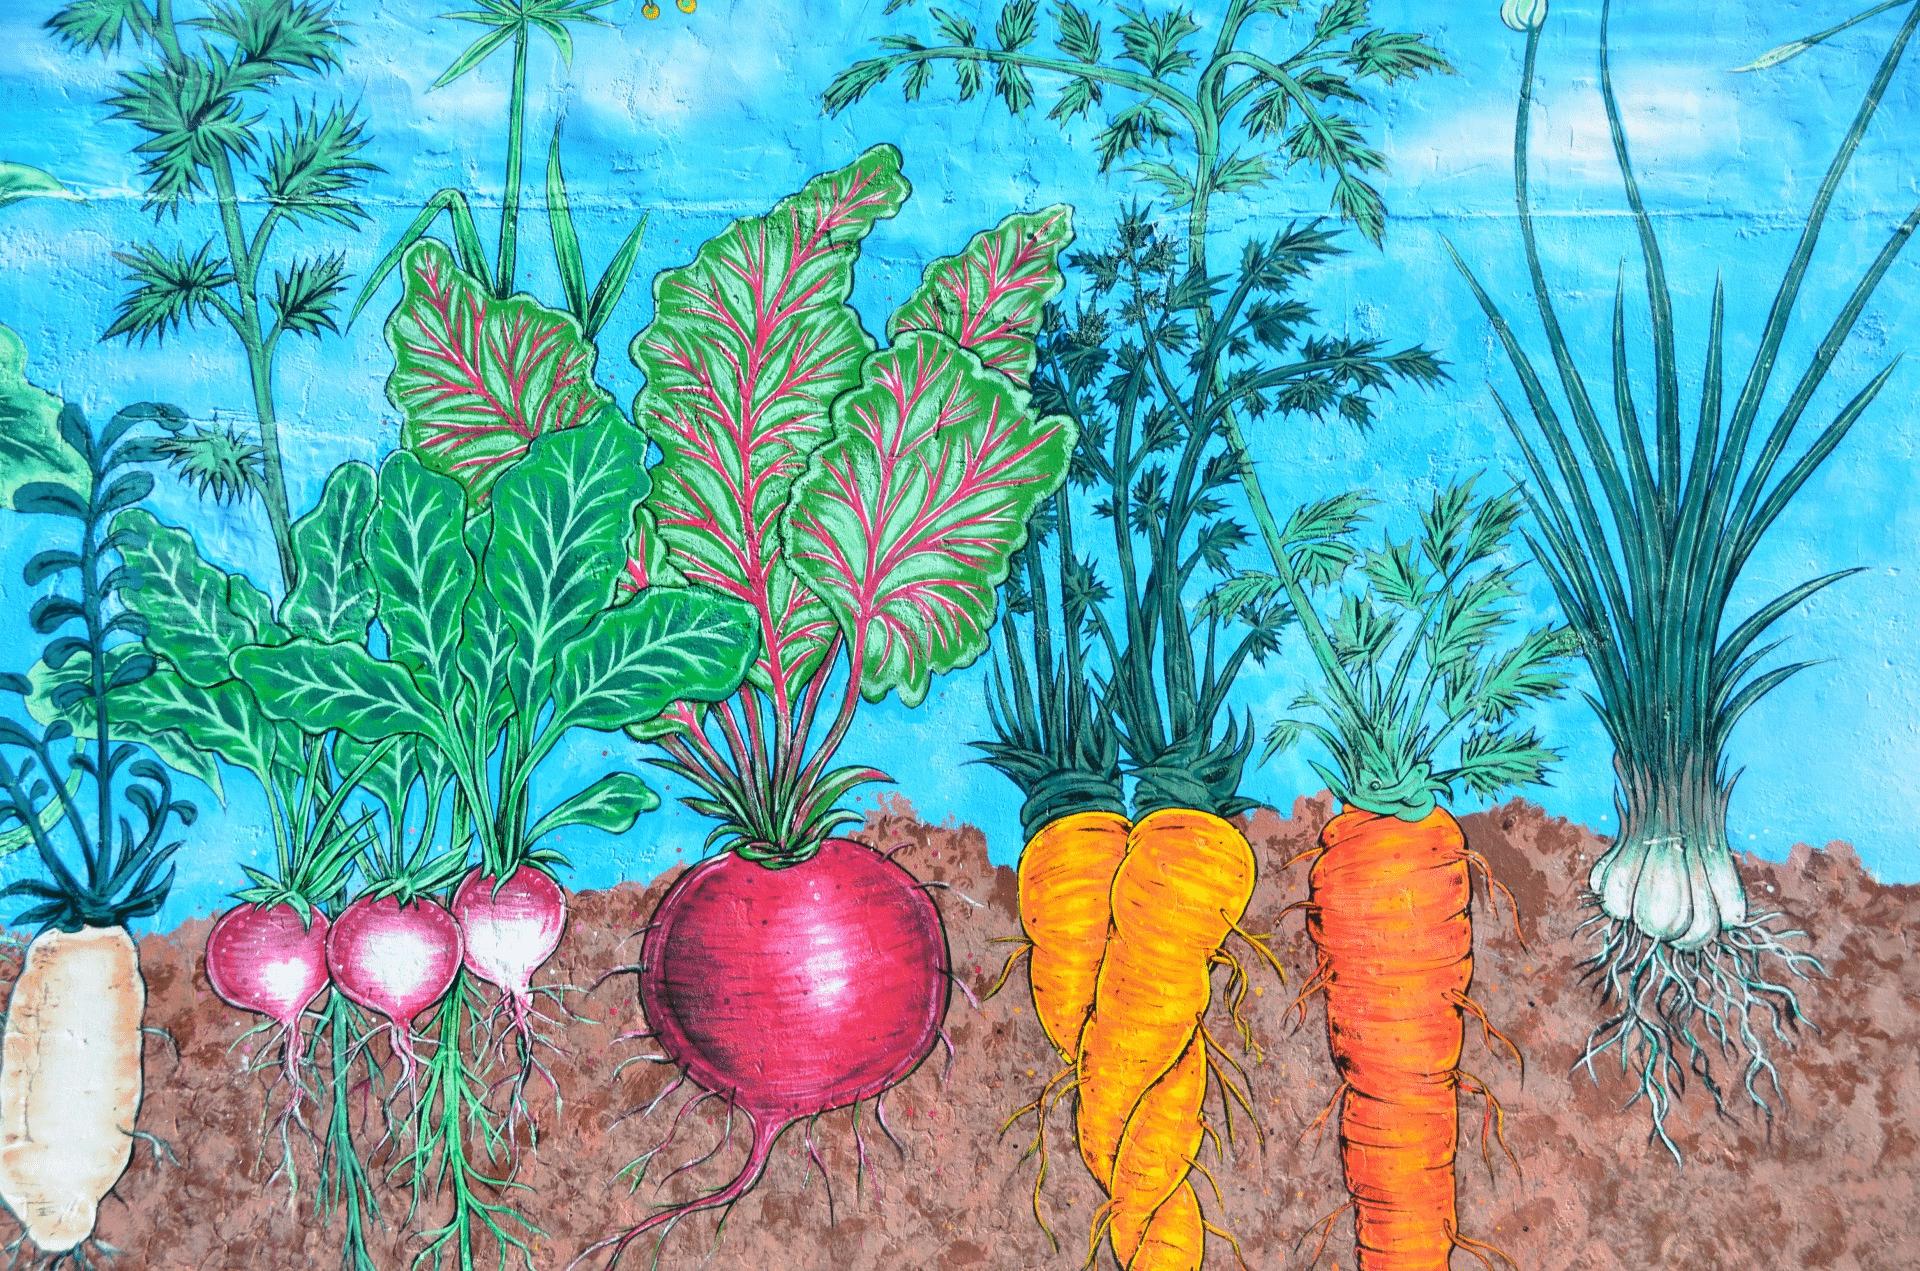 planter fra rustning